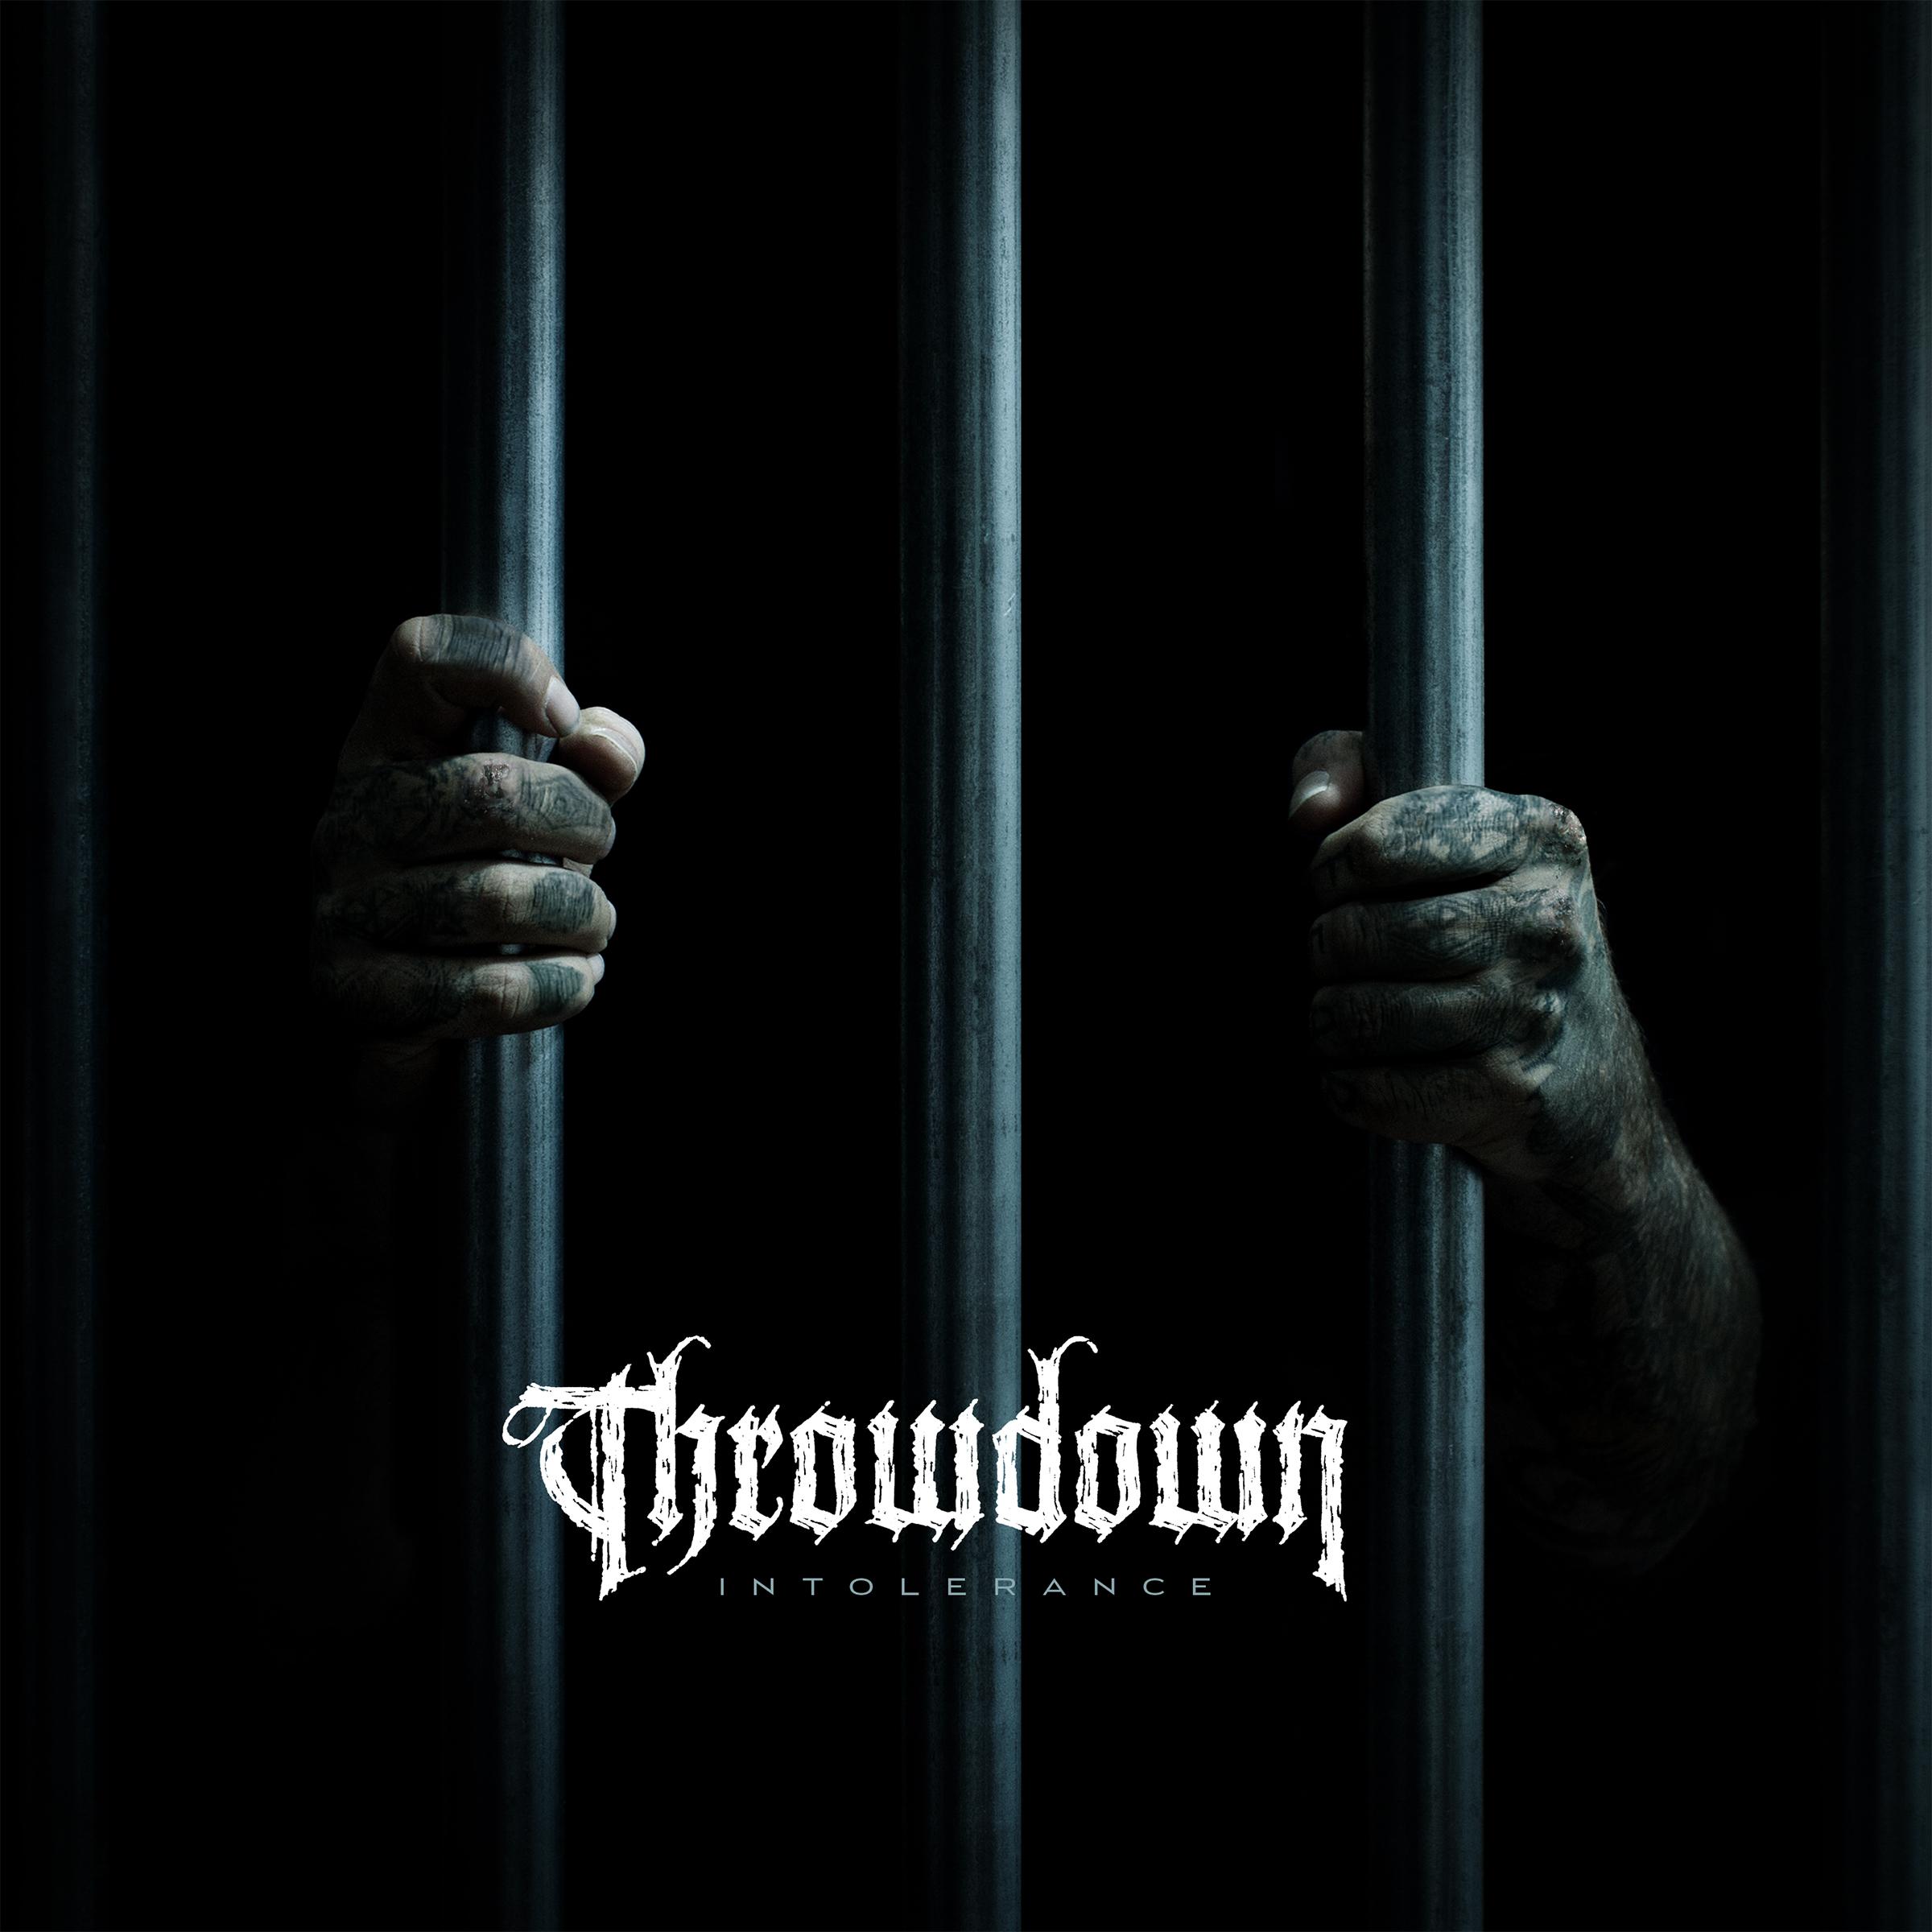 Throwdown_intolerance cover.jpg